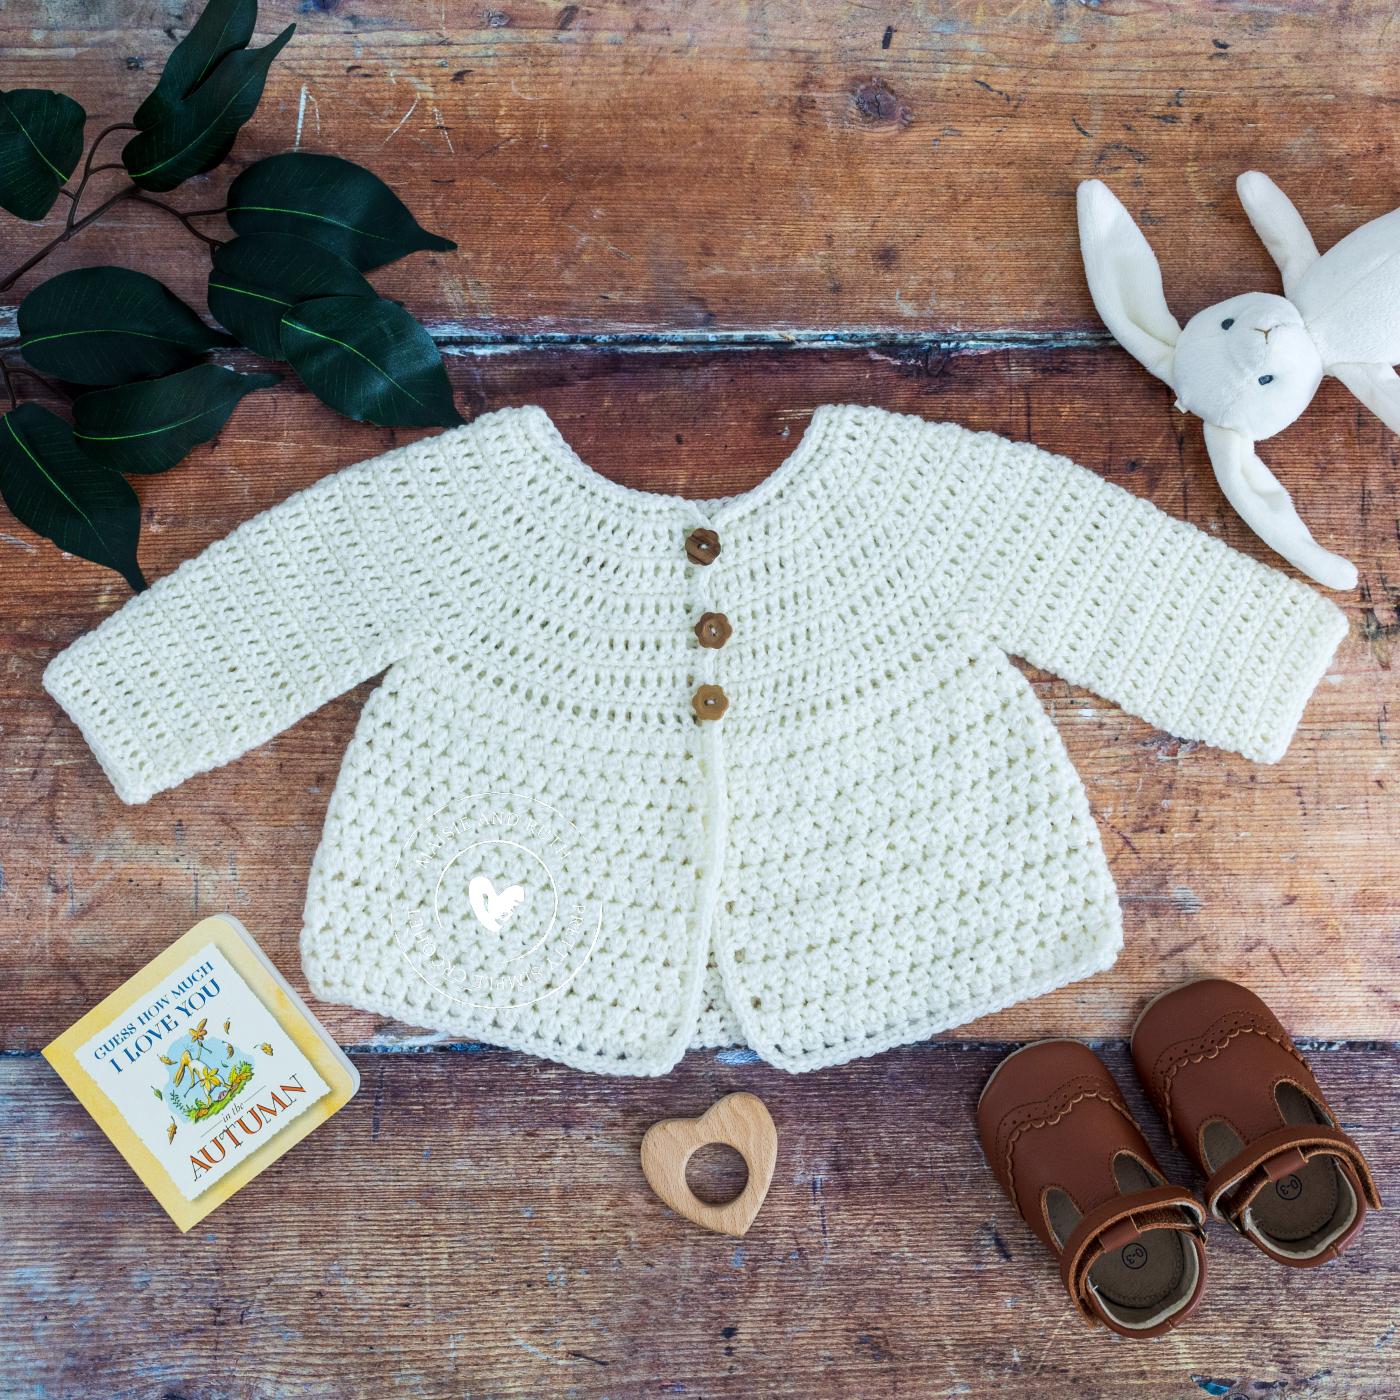 Crochet Baby Cardigan Pattern Layette on wood top